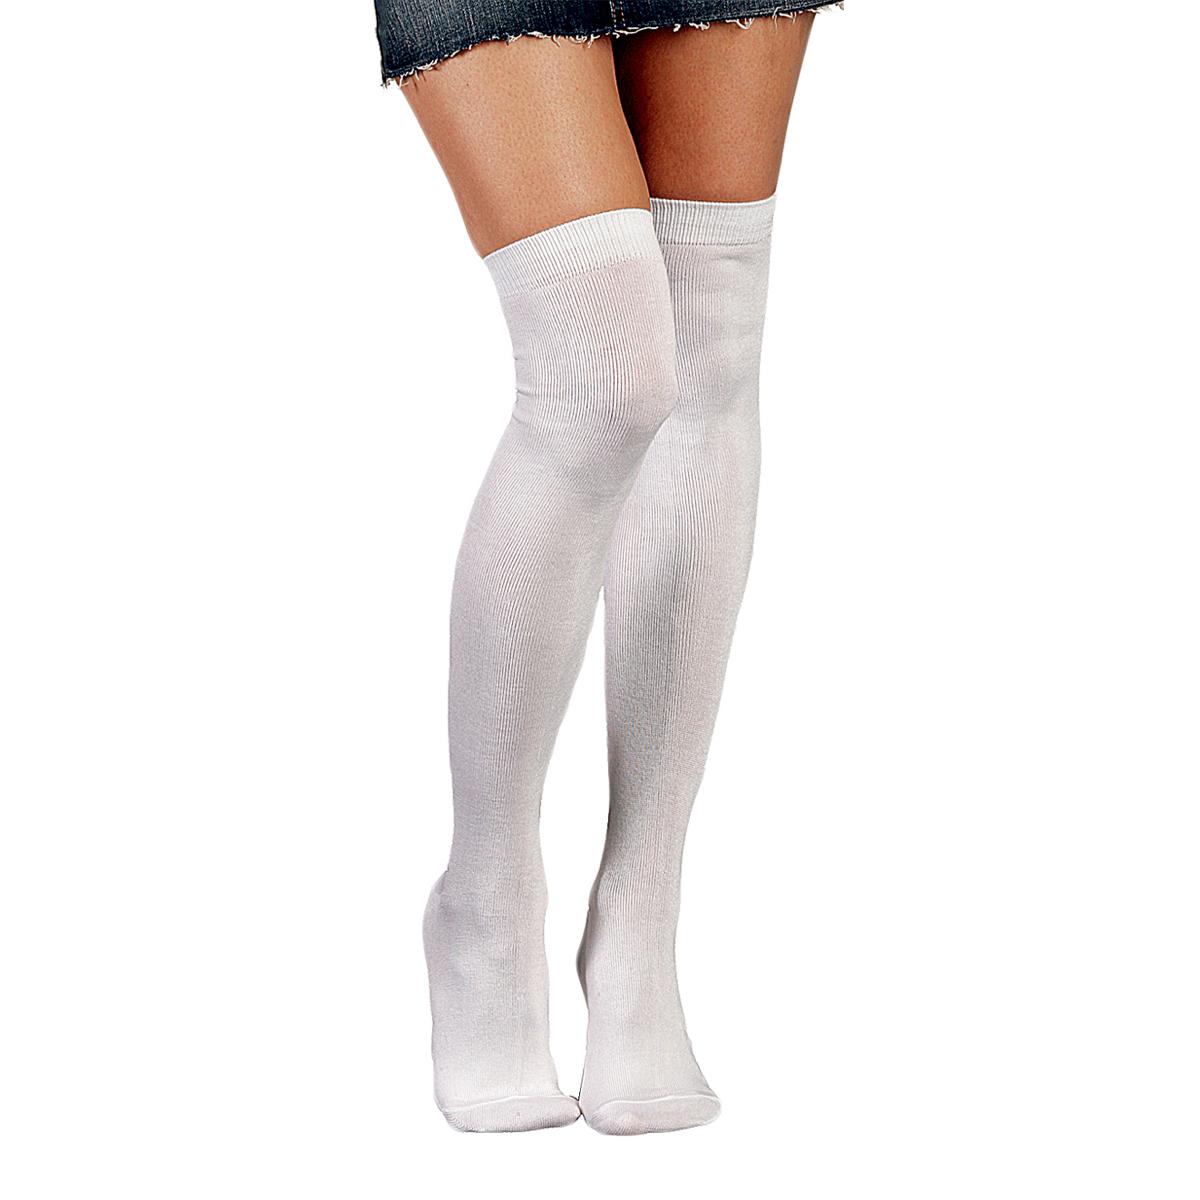 74d062bfe Over-the-Knee Socks